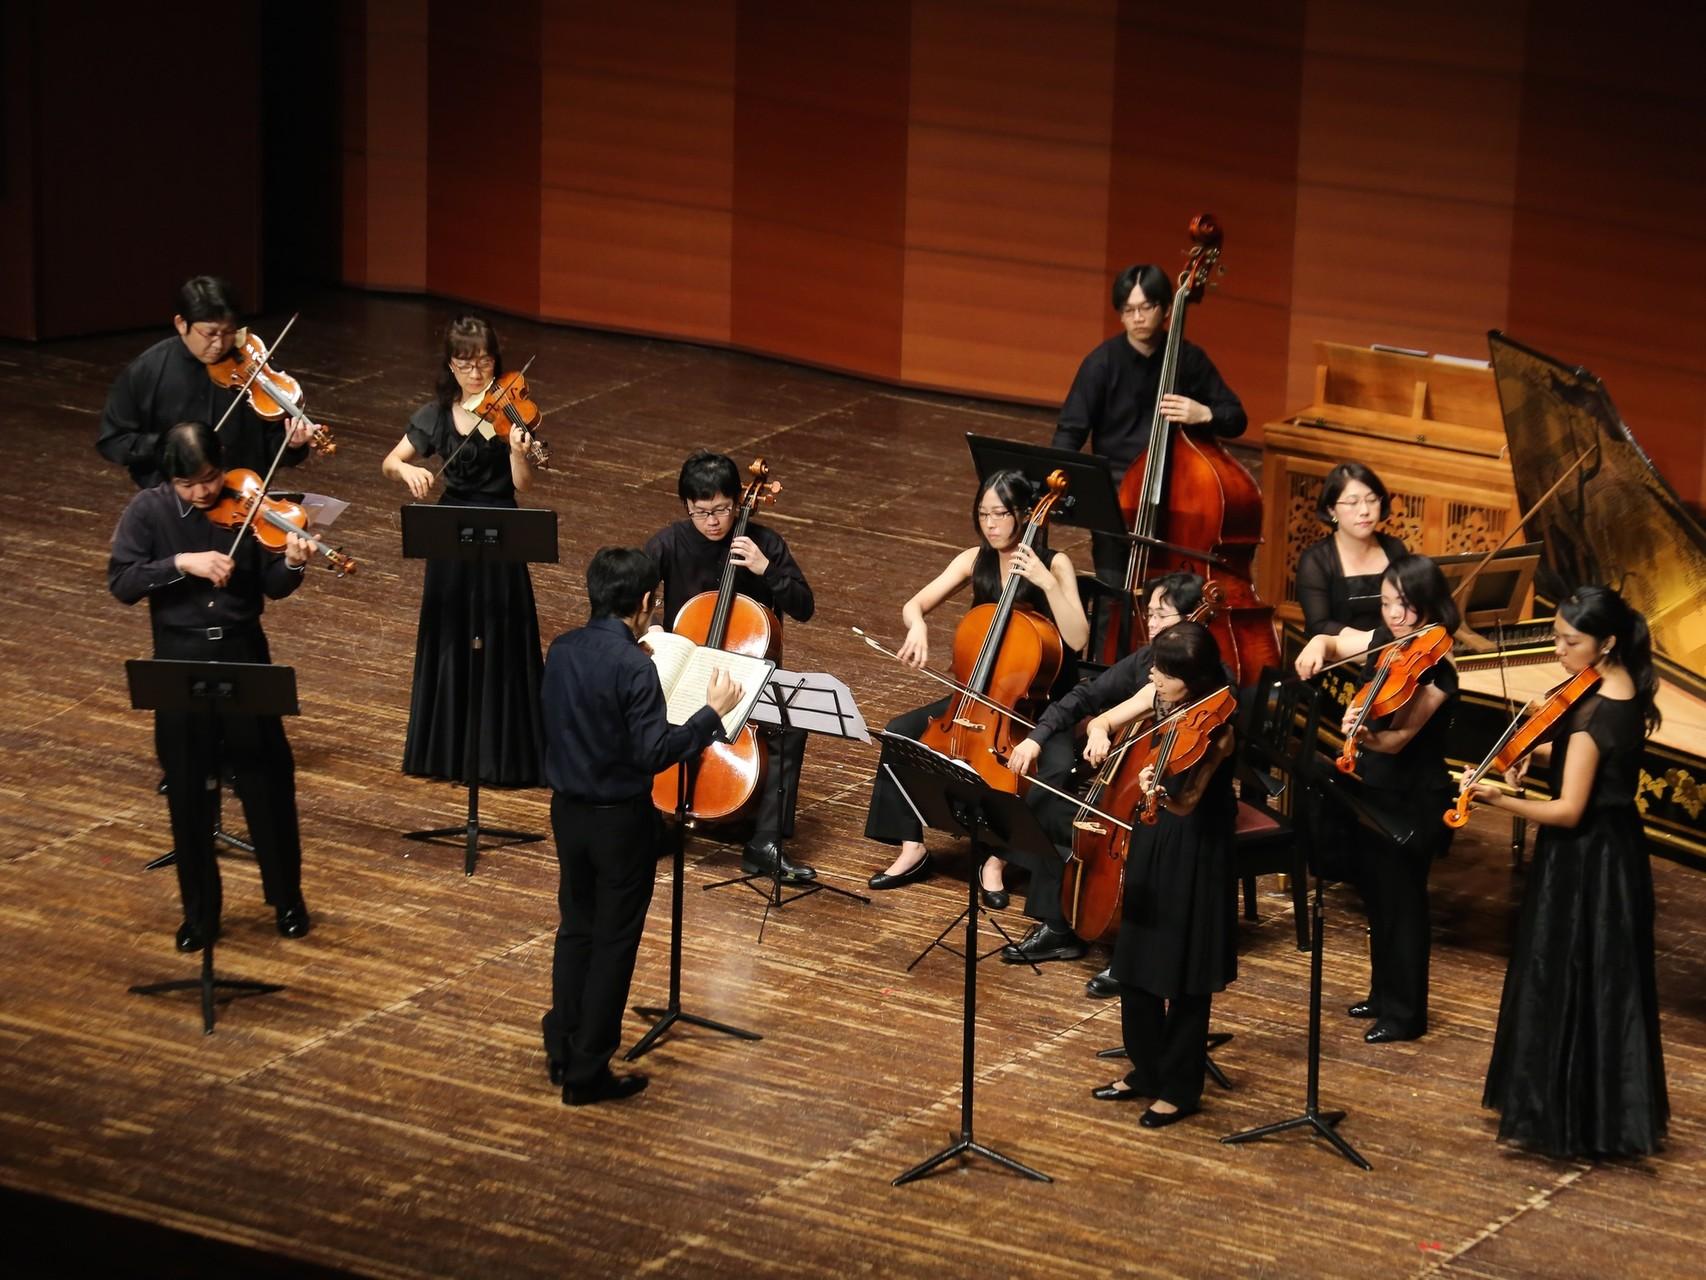 J.S.バッハ:ブランデンブルク協奏曲第3番 ト長調 BWV 1048